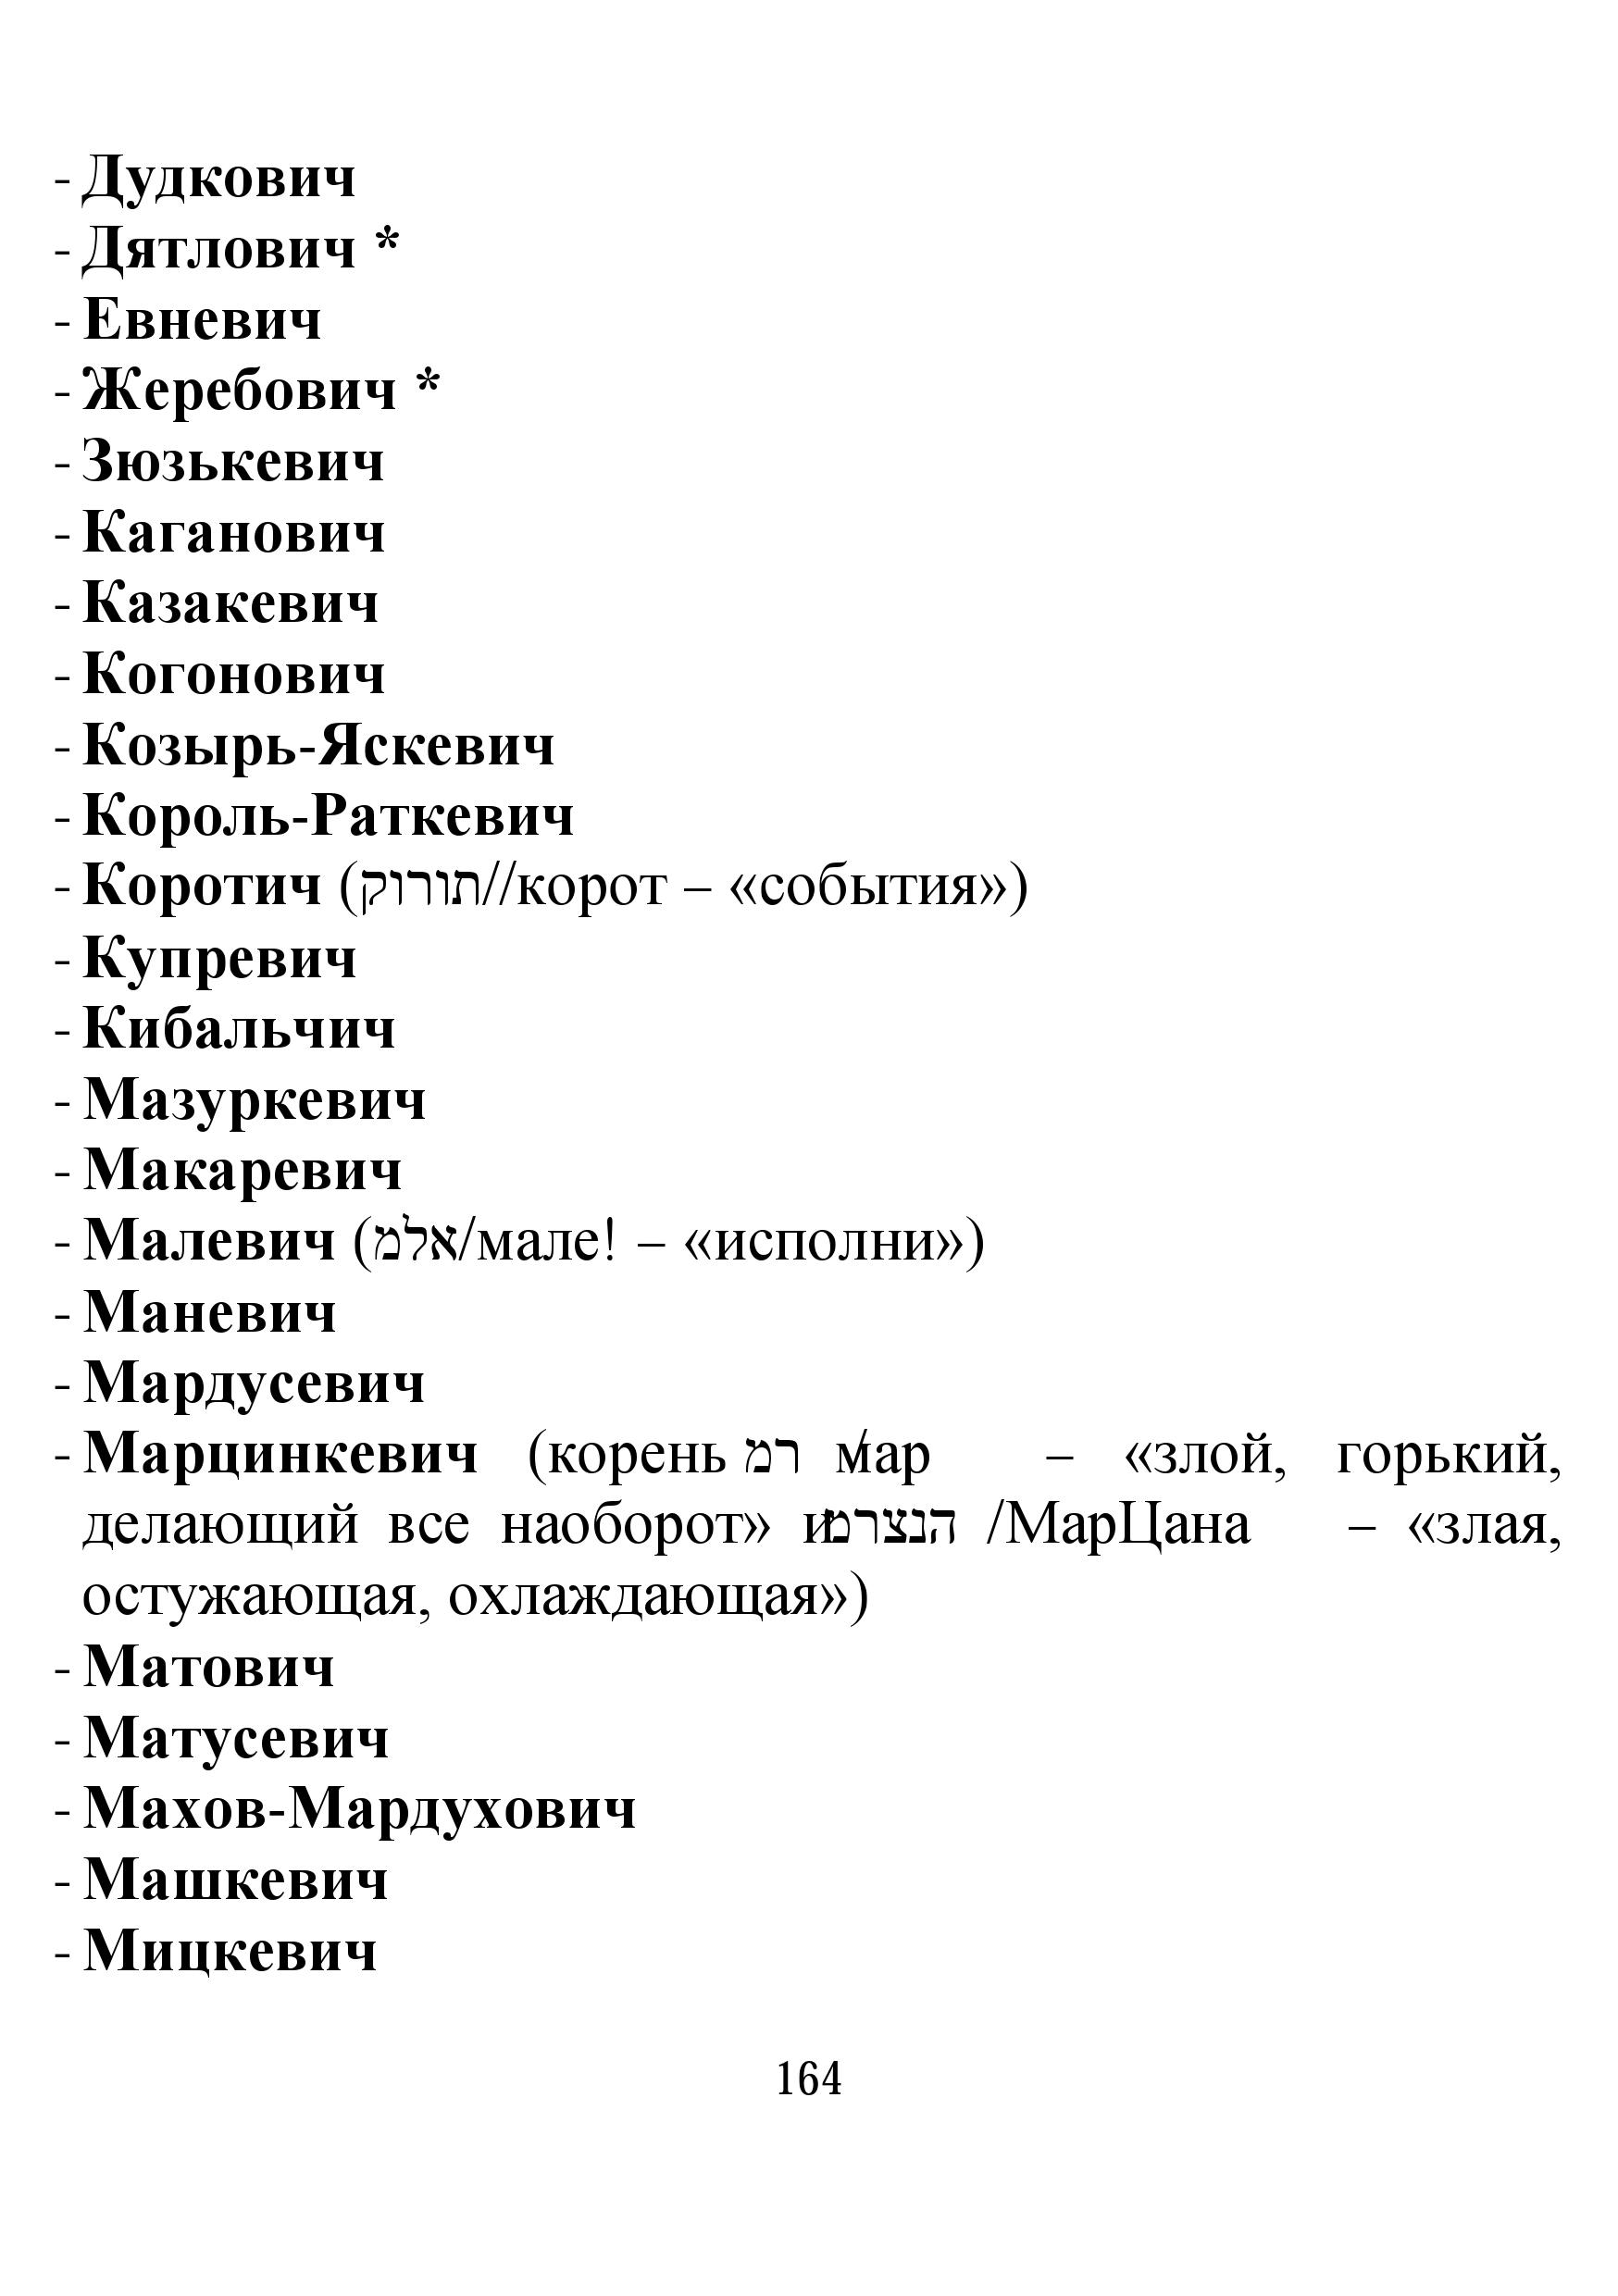 http://s0.uploads.ru/BCAWY.jpg